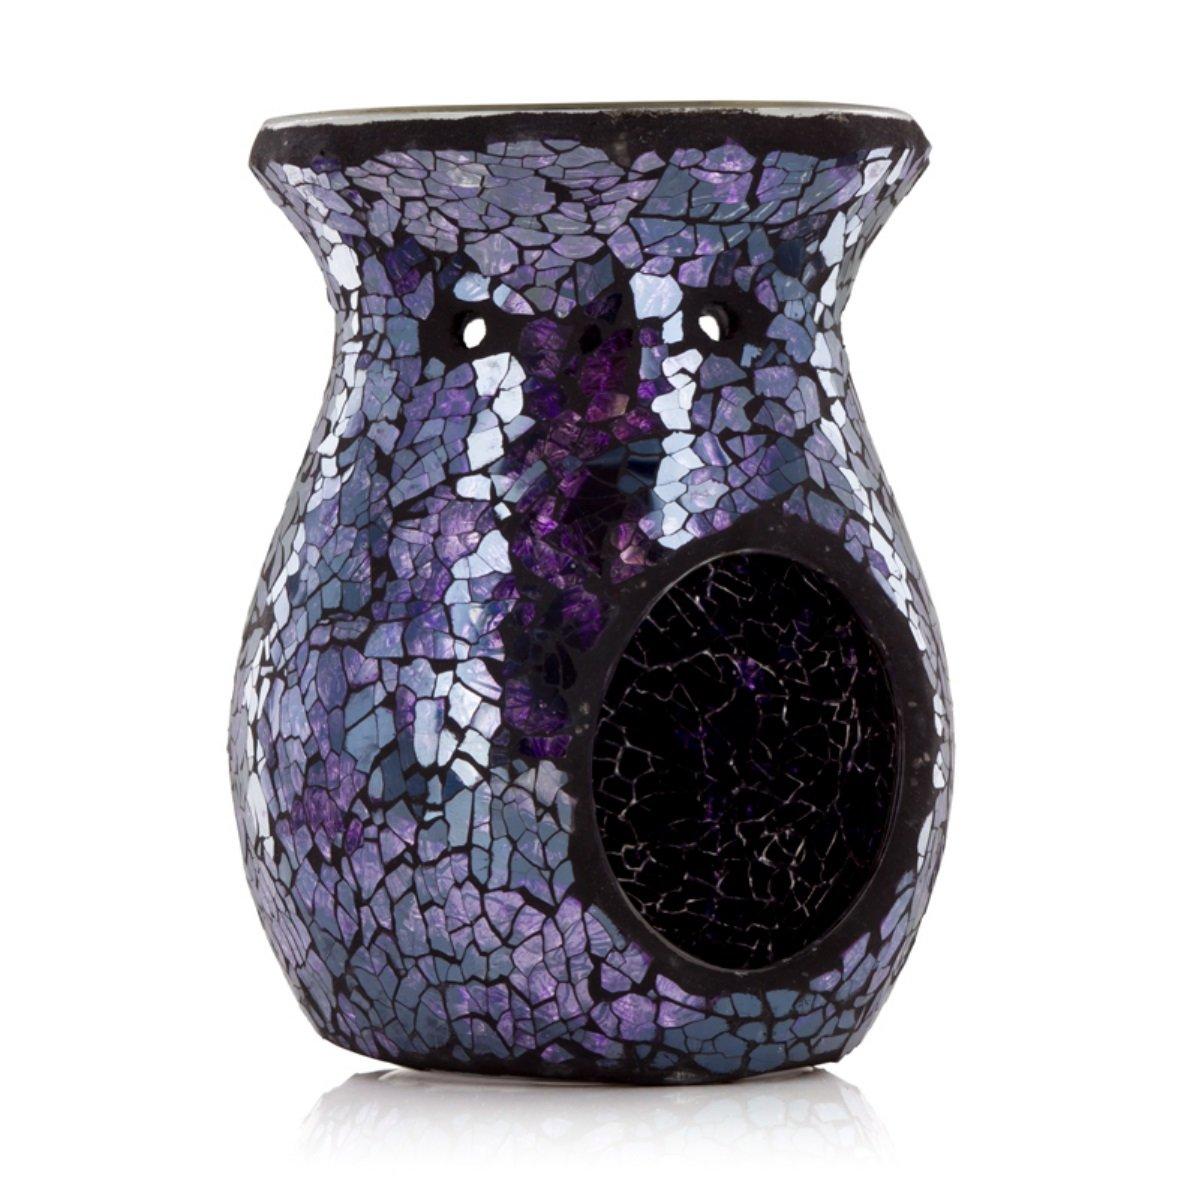 Ashleigh & Burwood - Classic Mosaic Oil Burner - Charmed